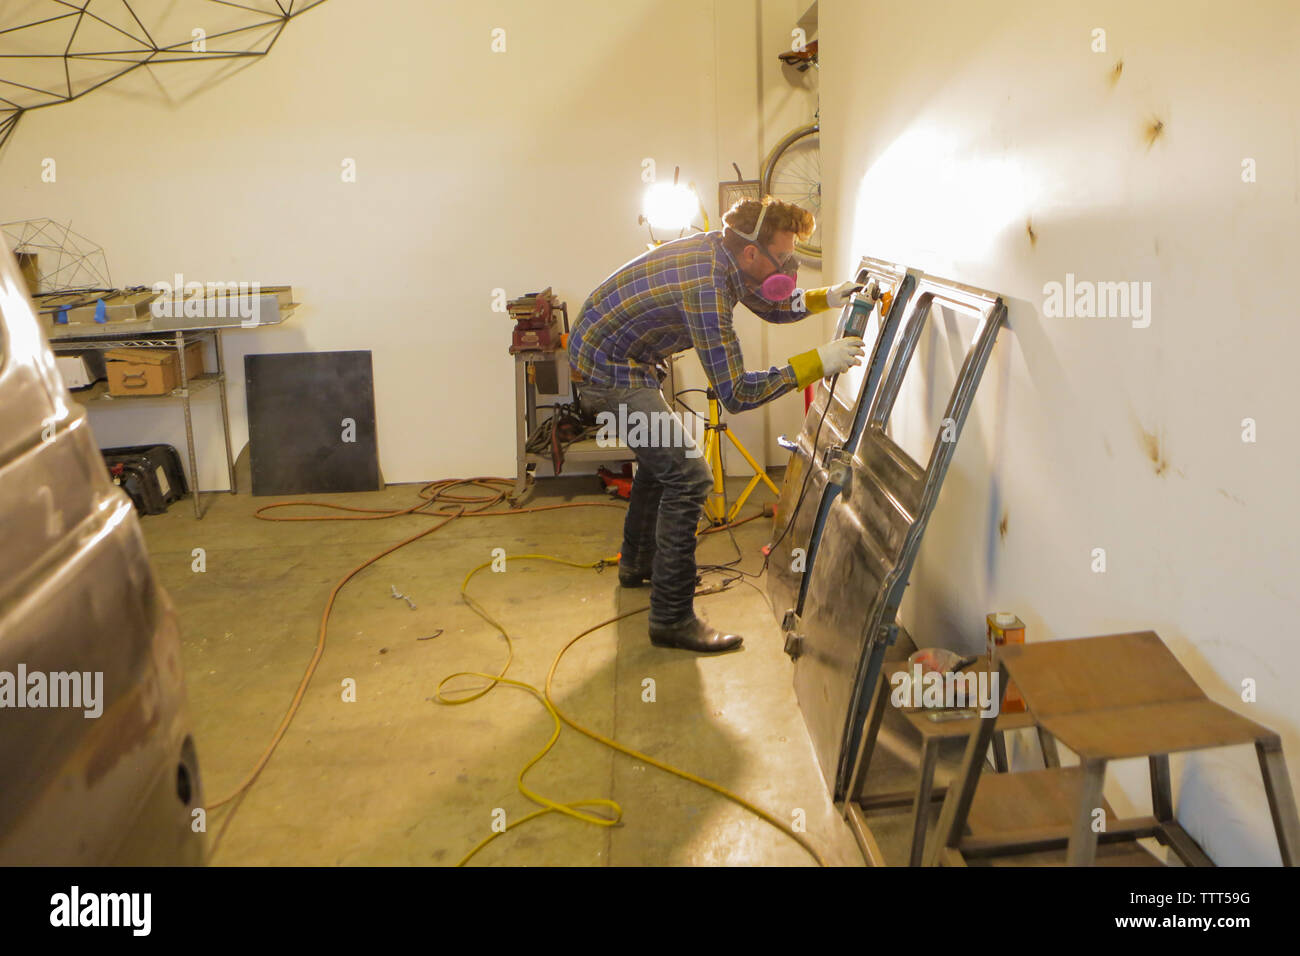 Engineer polishing van doors with angle grinder in factory - Stock Image